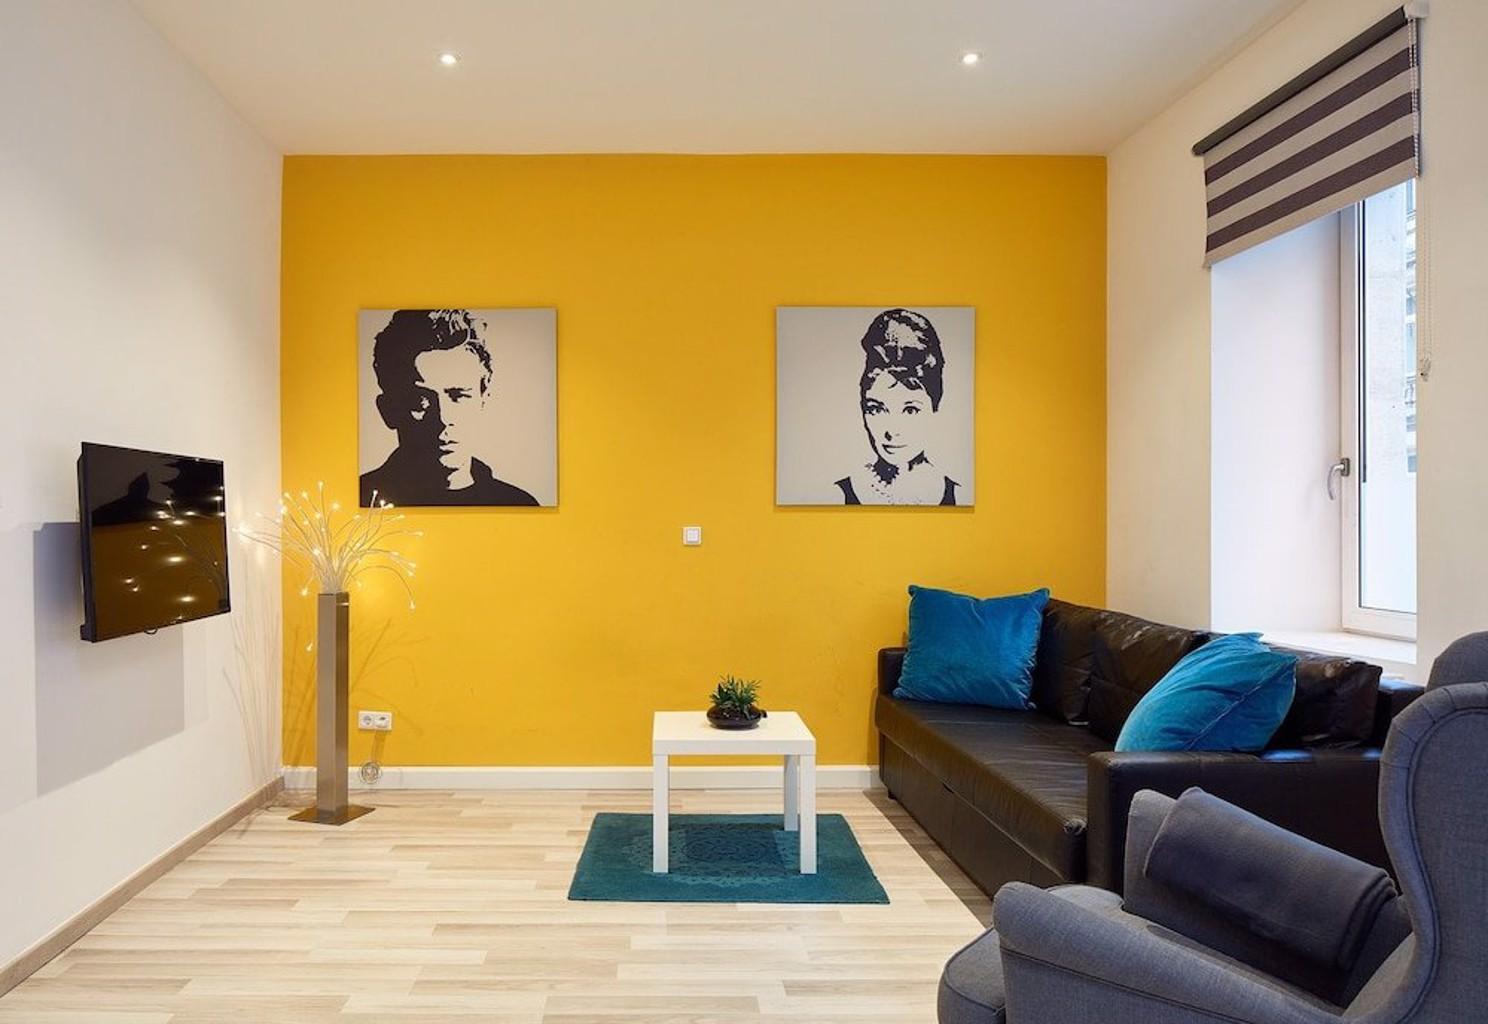 Apartments 4 YOU Goethestrasse